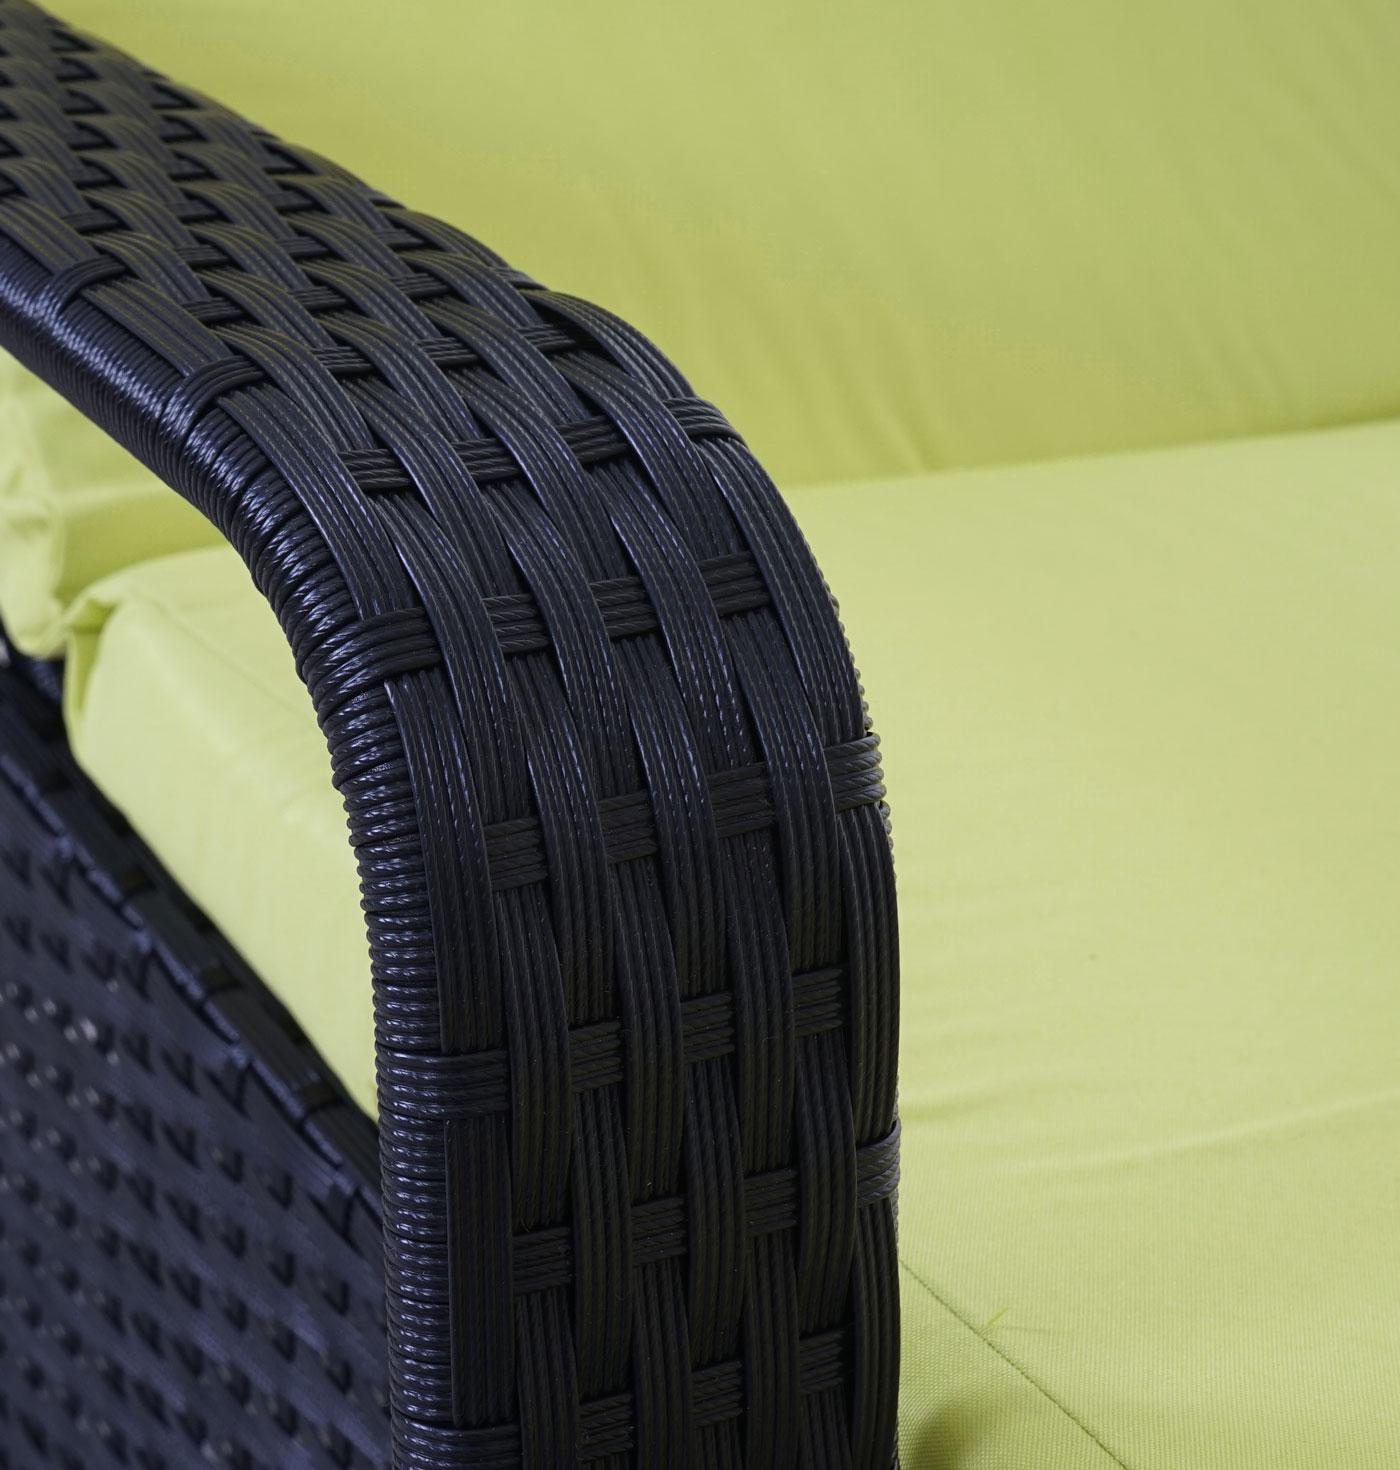 poly rattan sonnenliege carrara relaxliege gartenliege liege alu anthrazit kissen hellgr n. Black Bedroom Furniture Sets. Home Design Ideas